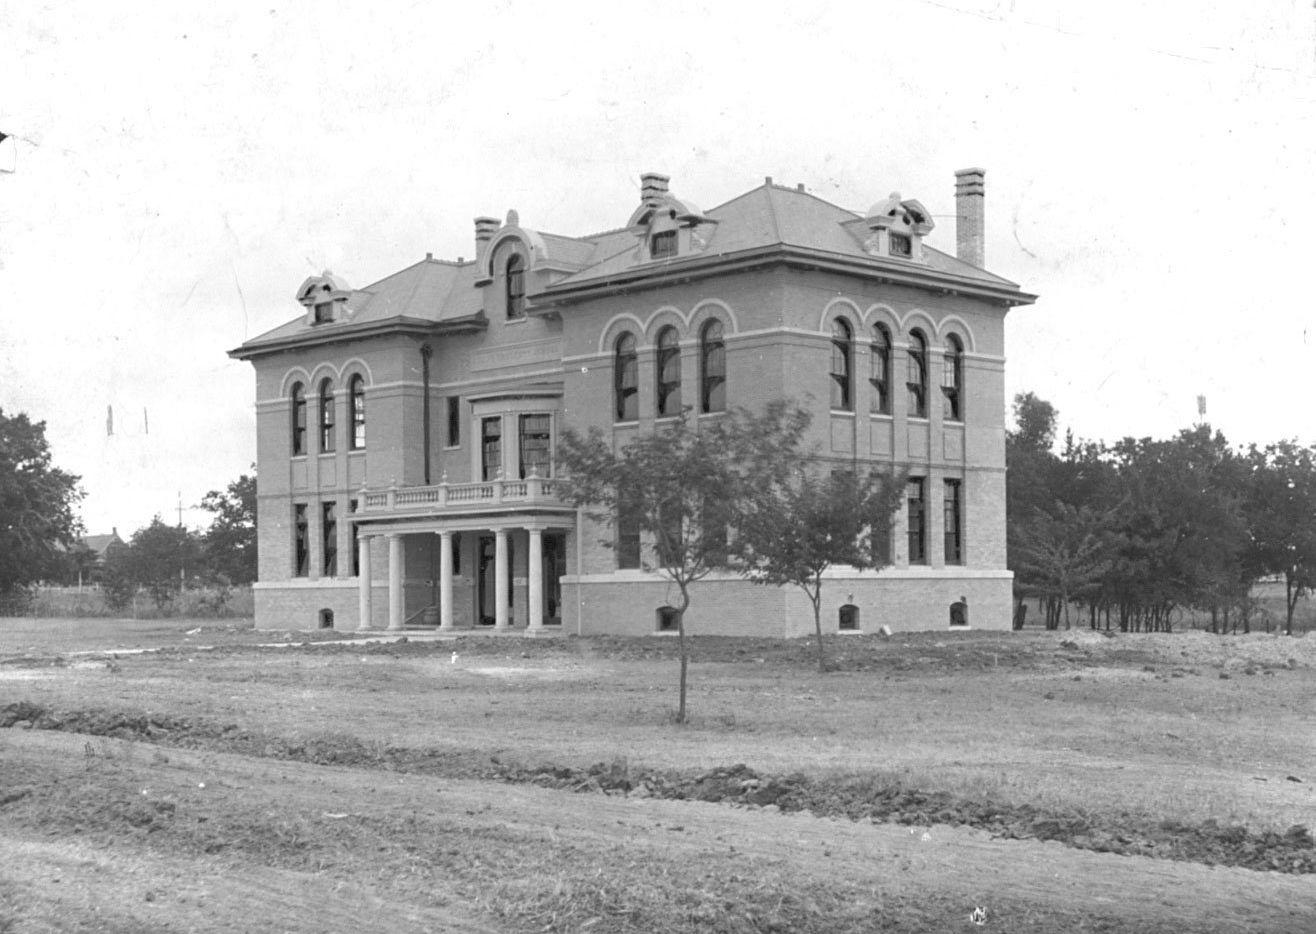 Undated photo of David Crockett School, built in 1903 on North Carroll Avenue. The school has had numerous names.